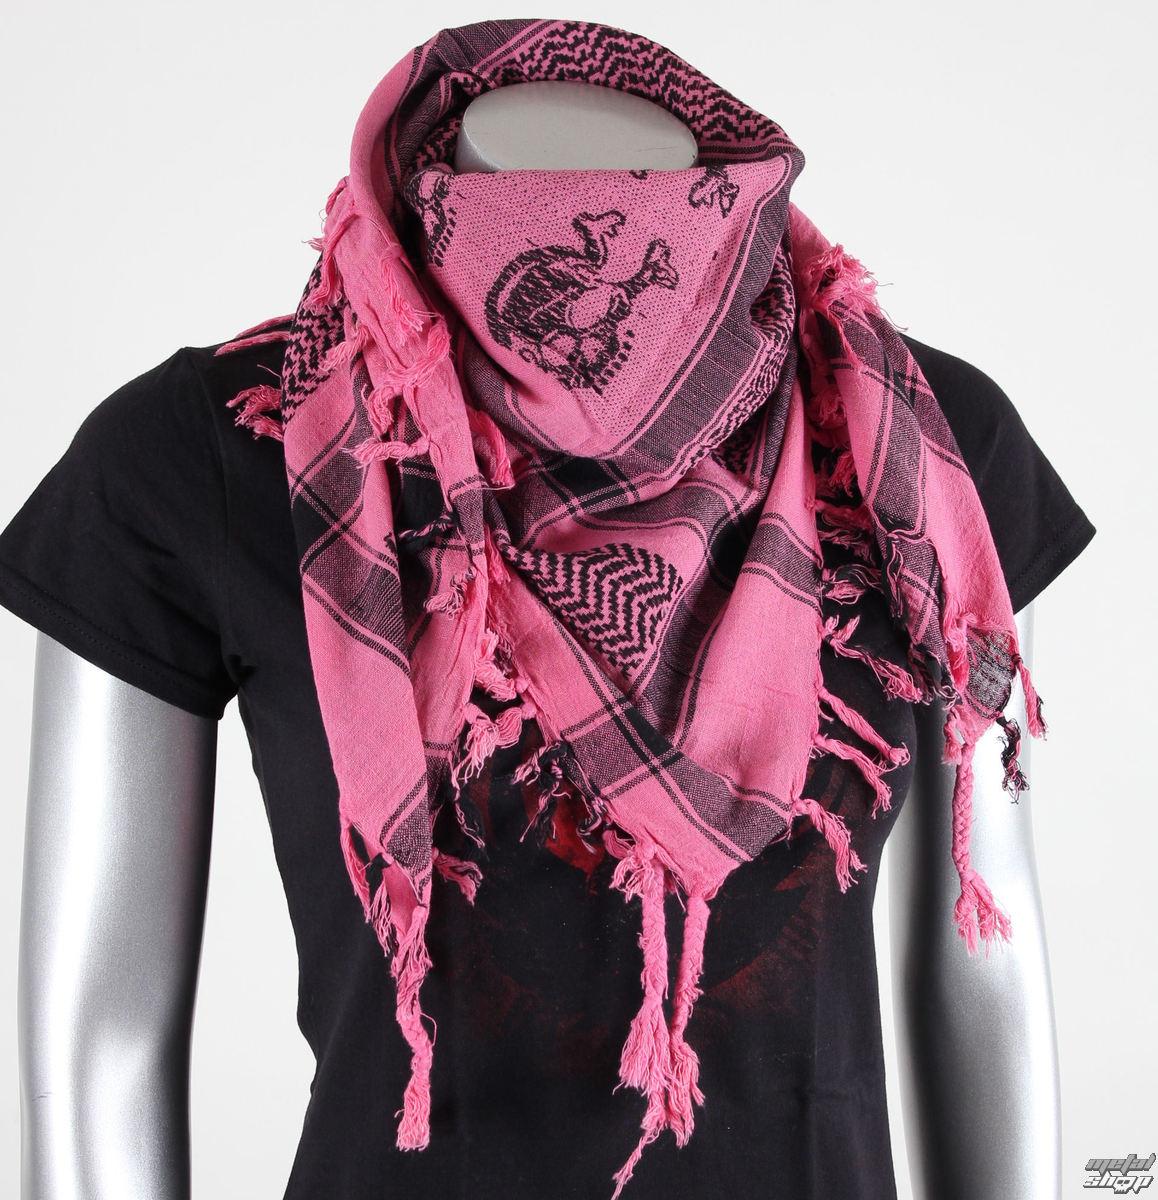 šátek ARAFAT - palestina - lebka 14 - růžová - metalshop.cz 028558754a